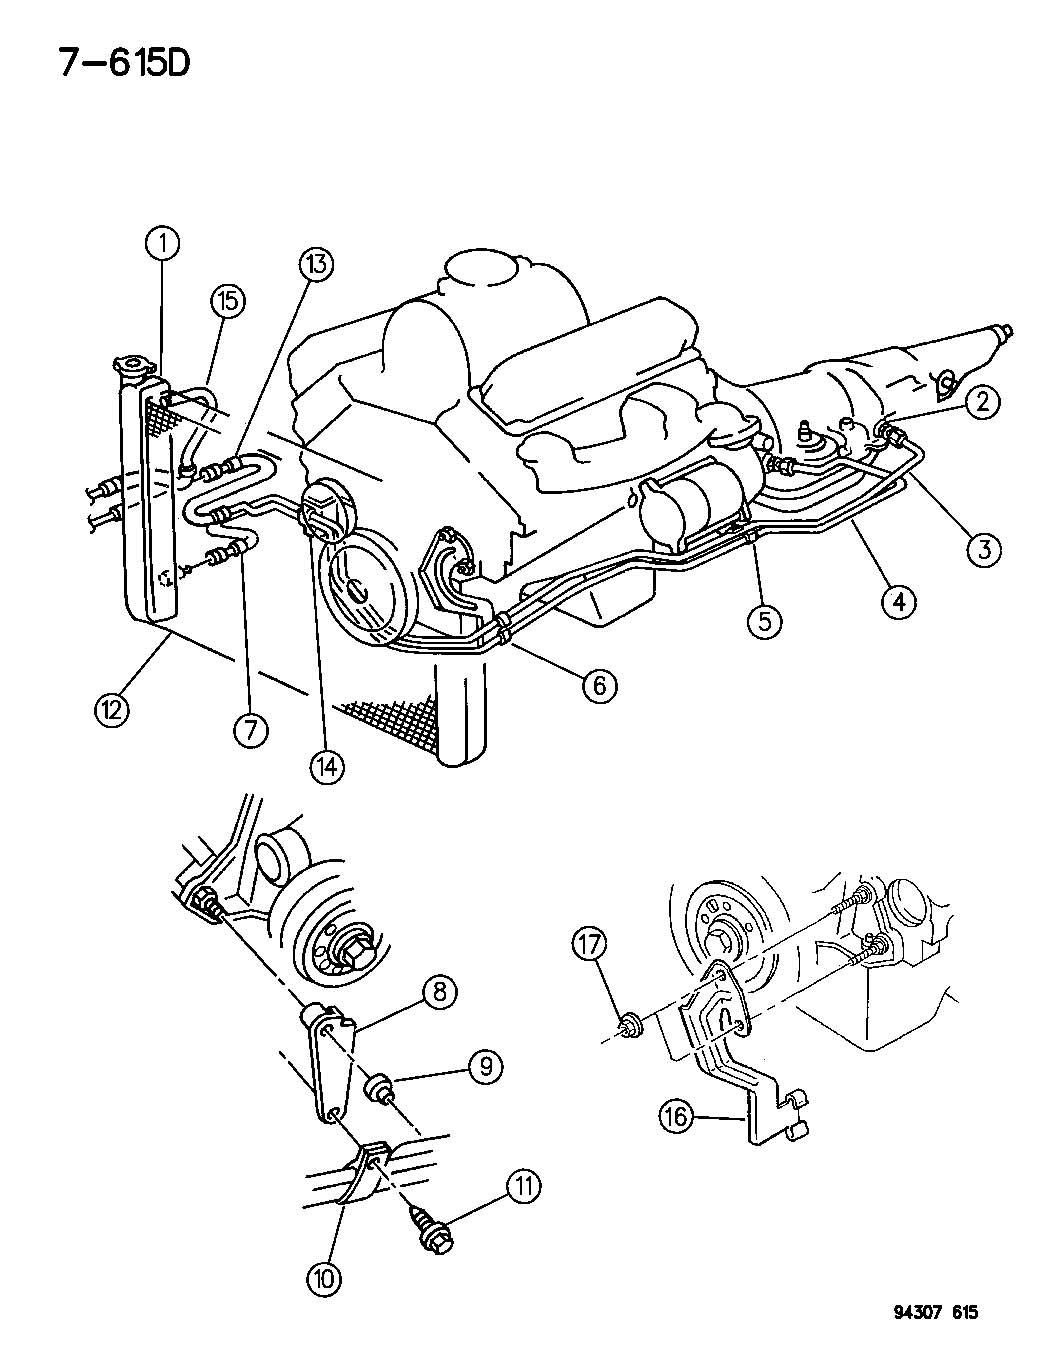 Dodge Ram 150 250 350 Connector Oil Cooler Tube Case Relatedsel